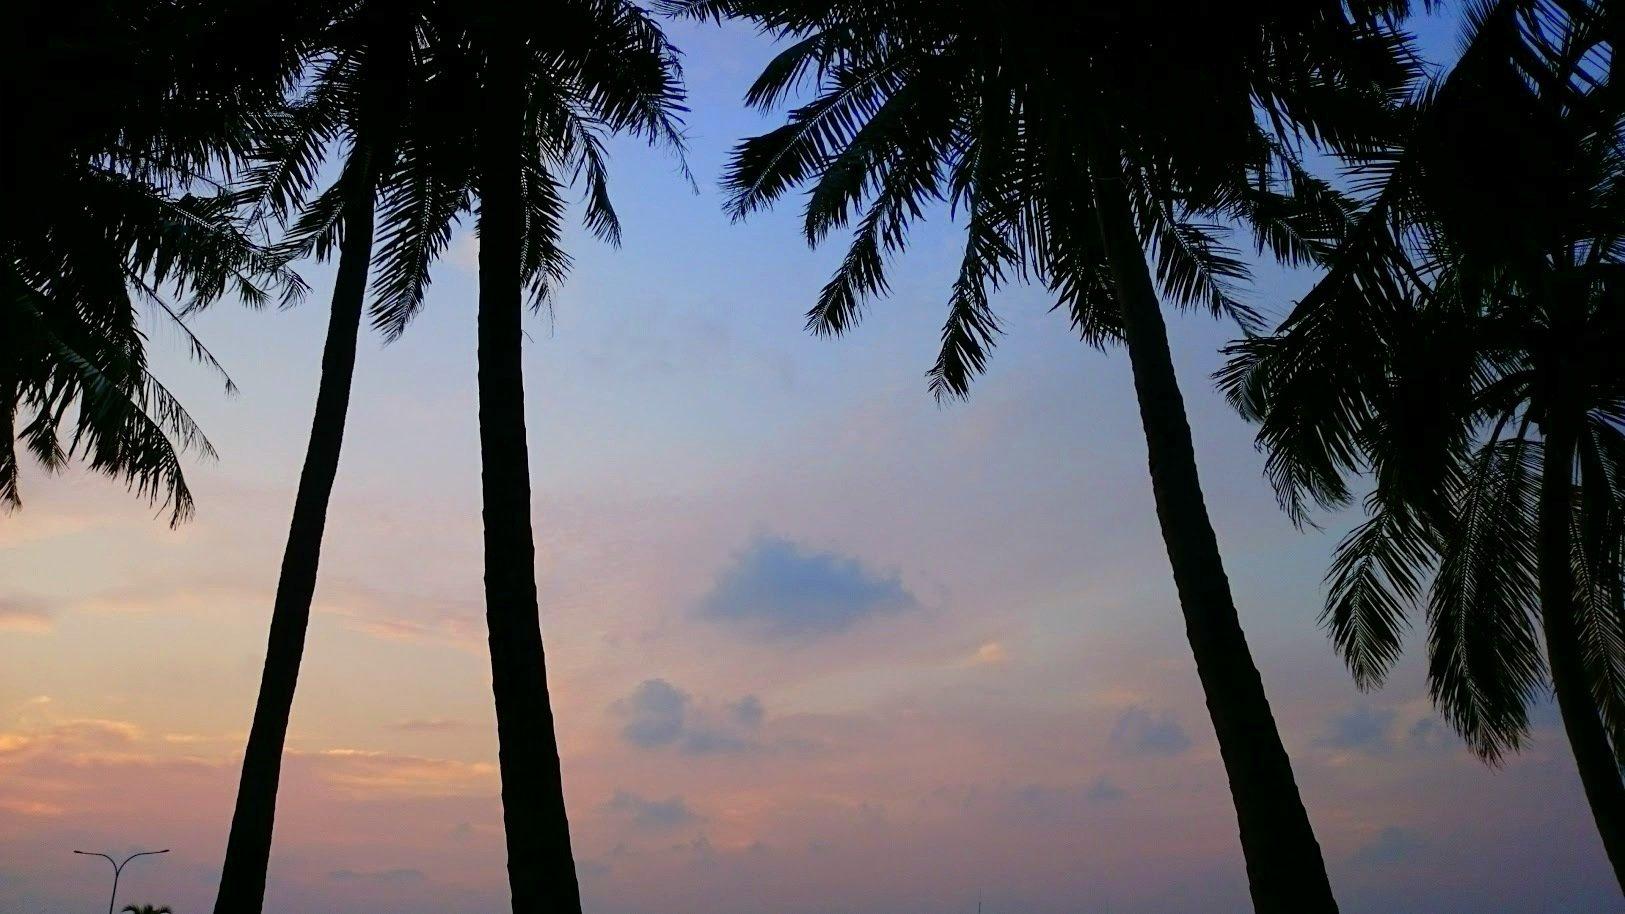 Malediivit Maafushi budjettimatka edullisesti auringonlasku